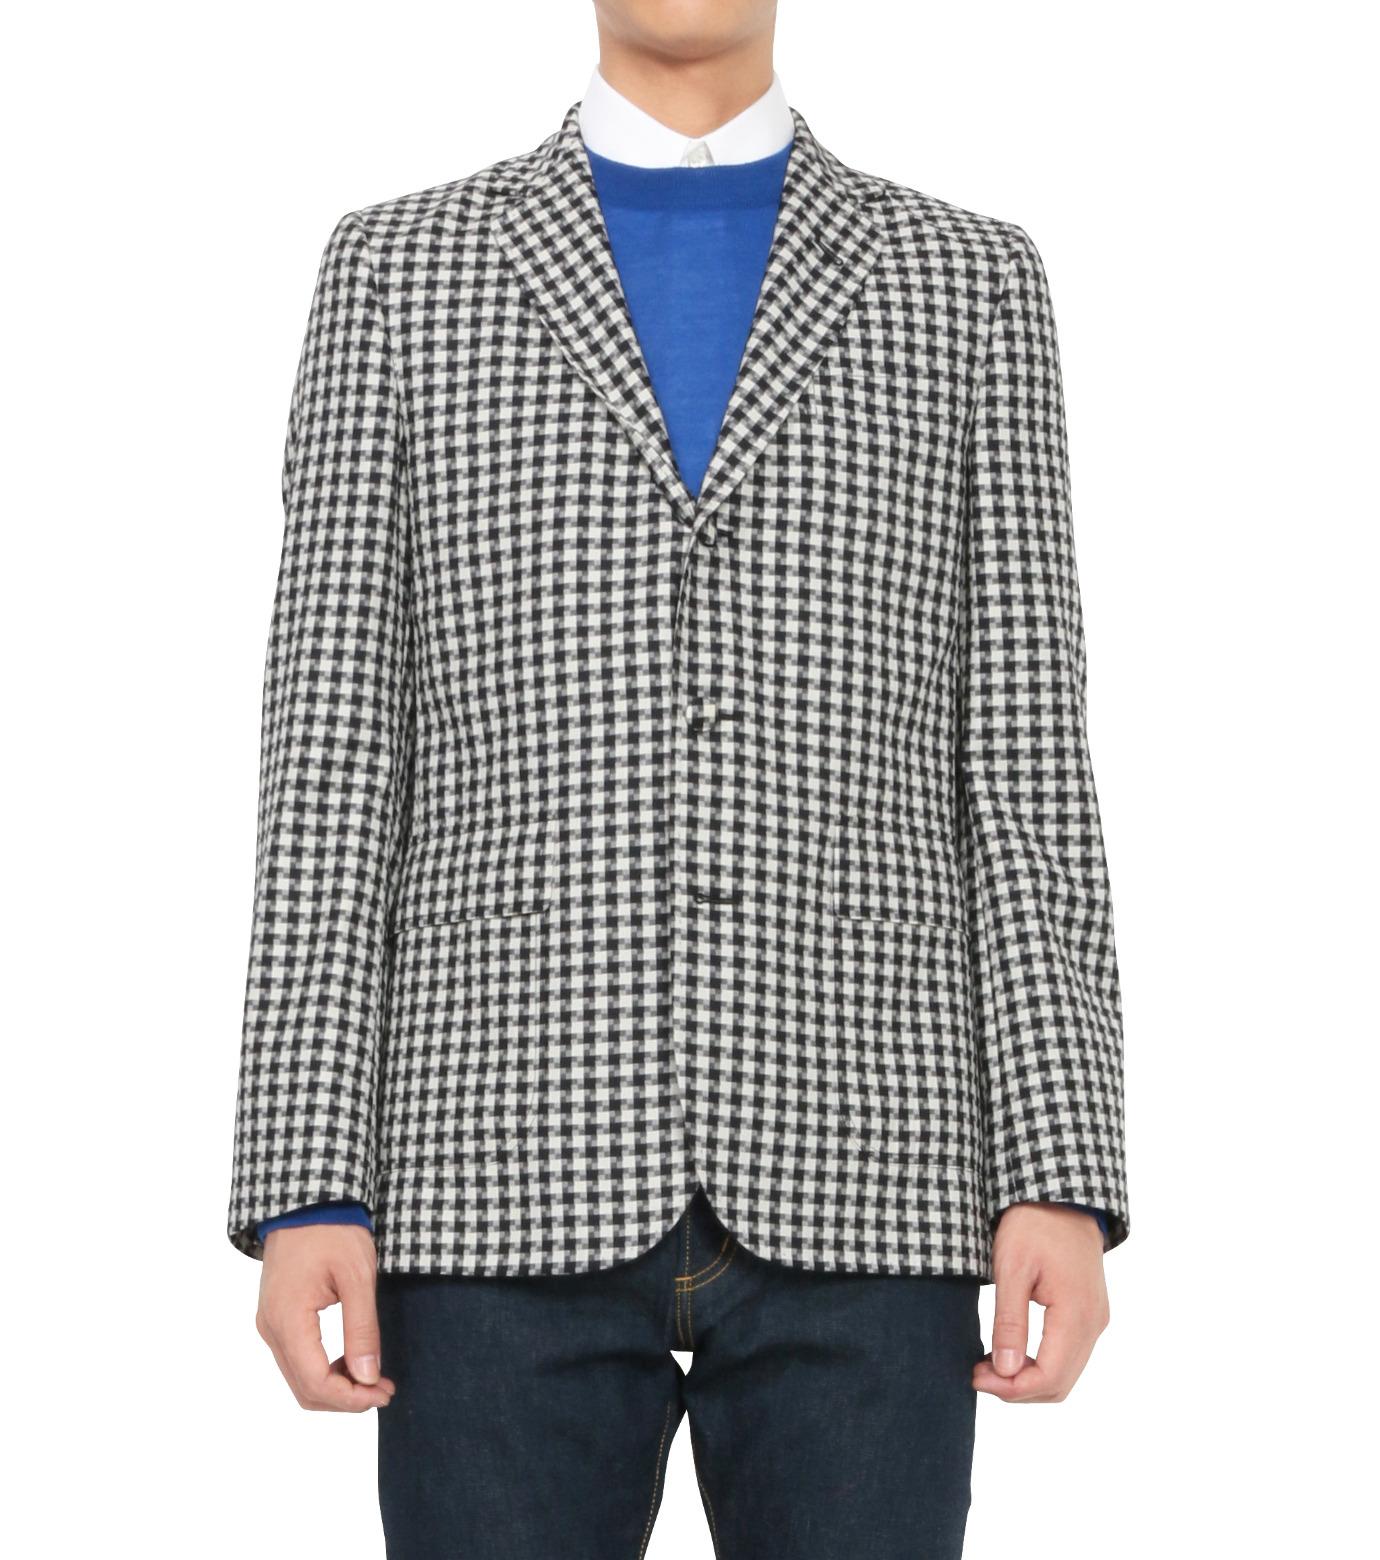 MAISON KITSUNÉ(メゾンキツネ)のSheepherds Check Jacket-BLACK(ジャケット/jacket)-KMV0503-13 拡大詳細画像1